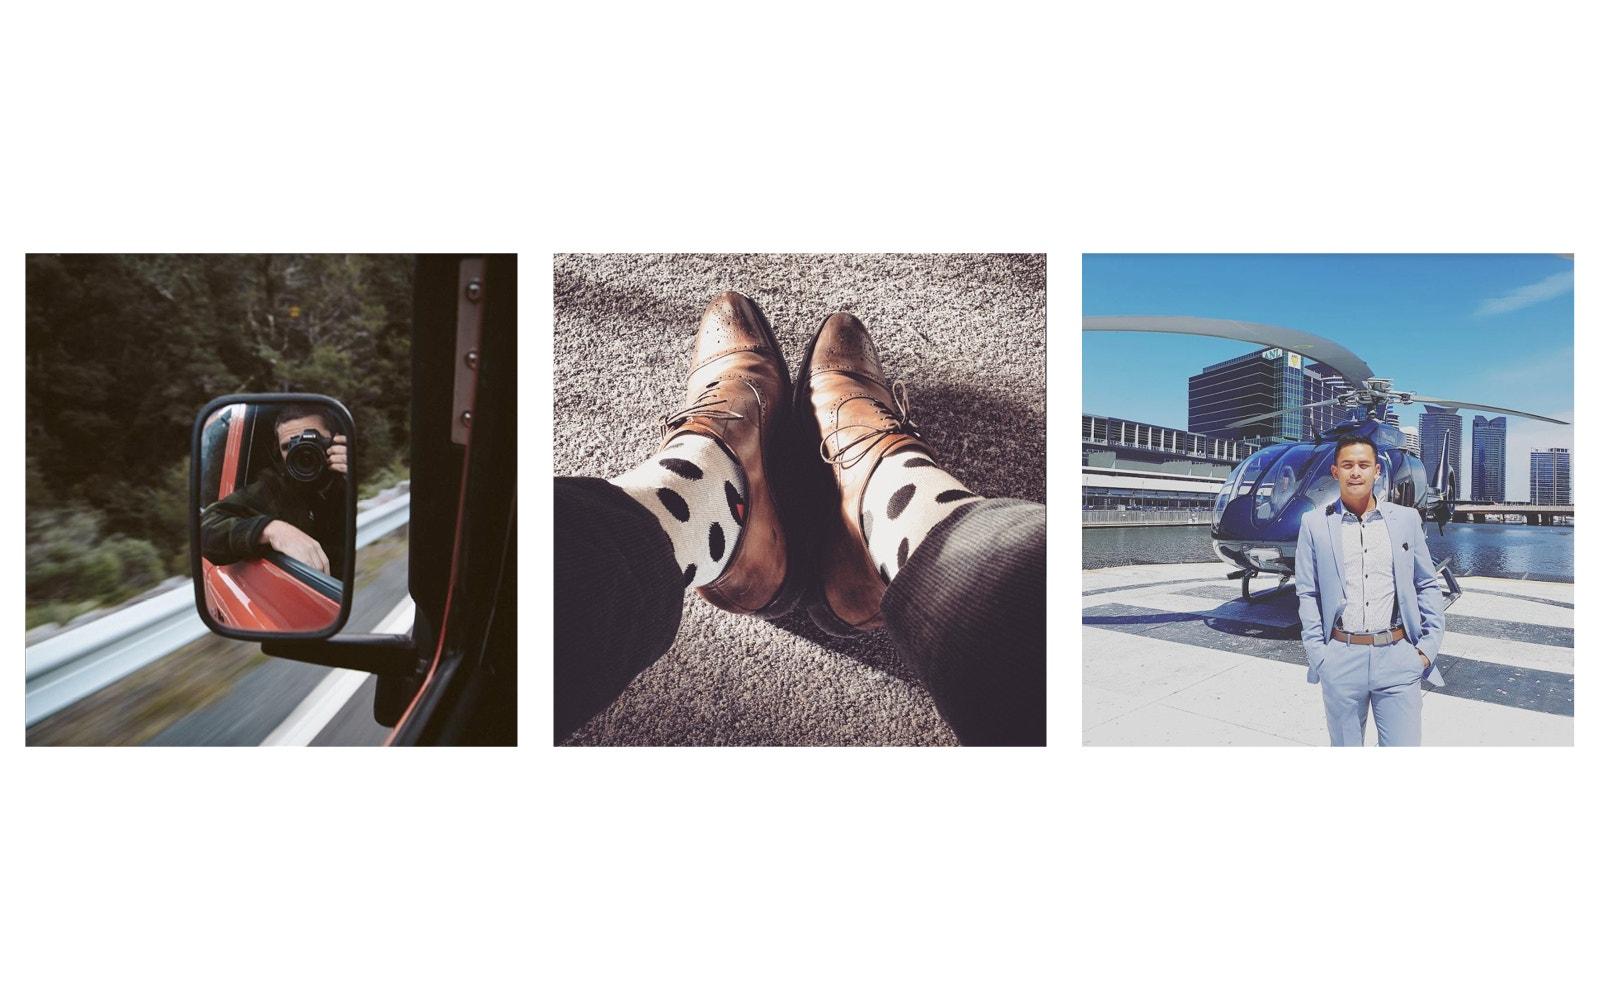 Instagrammers 2